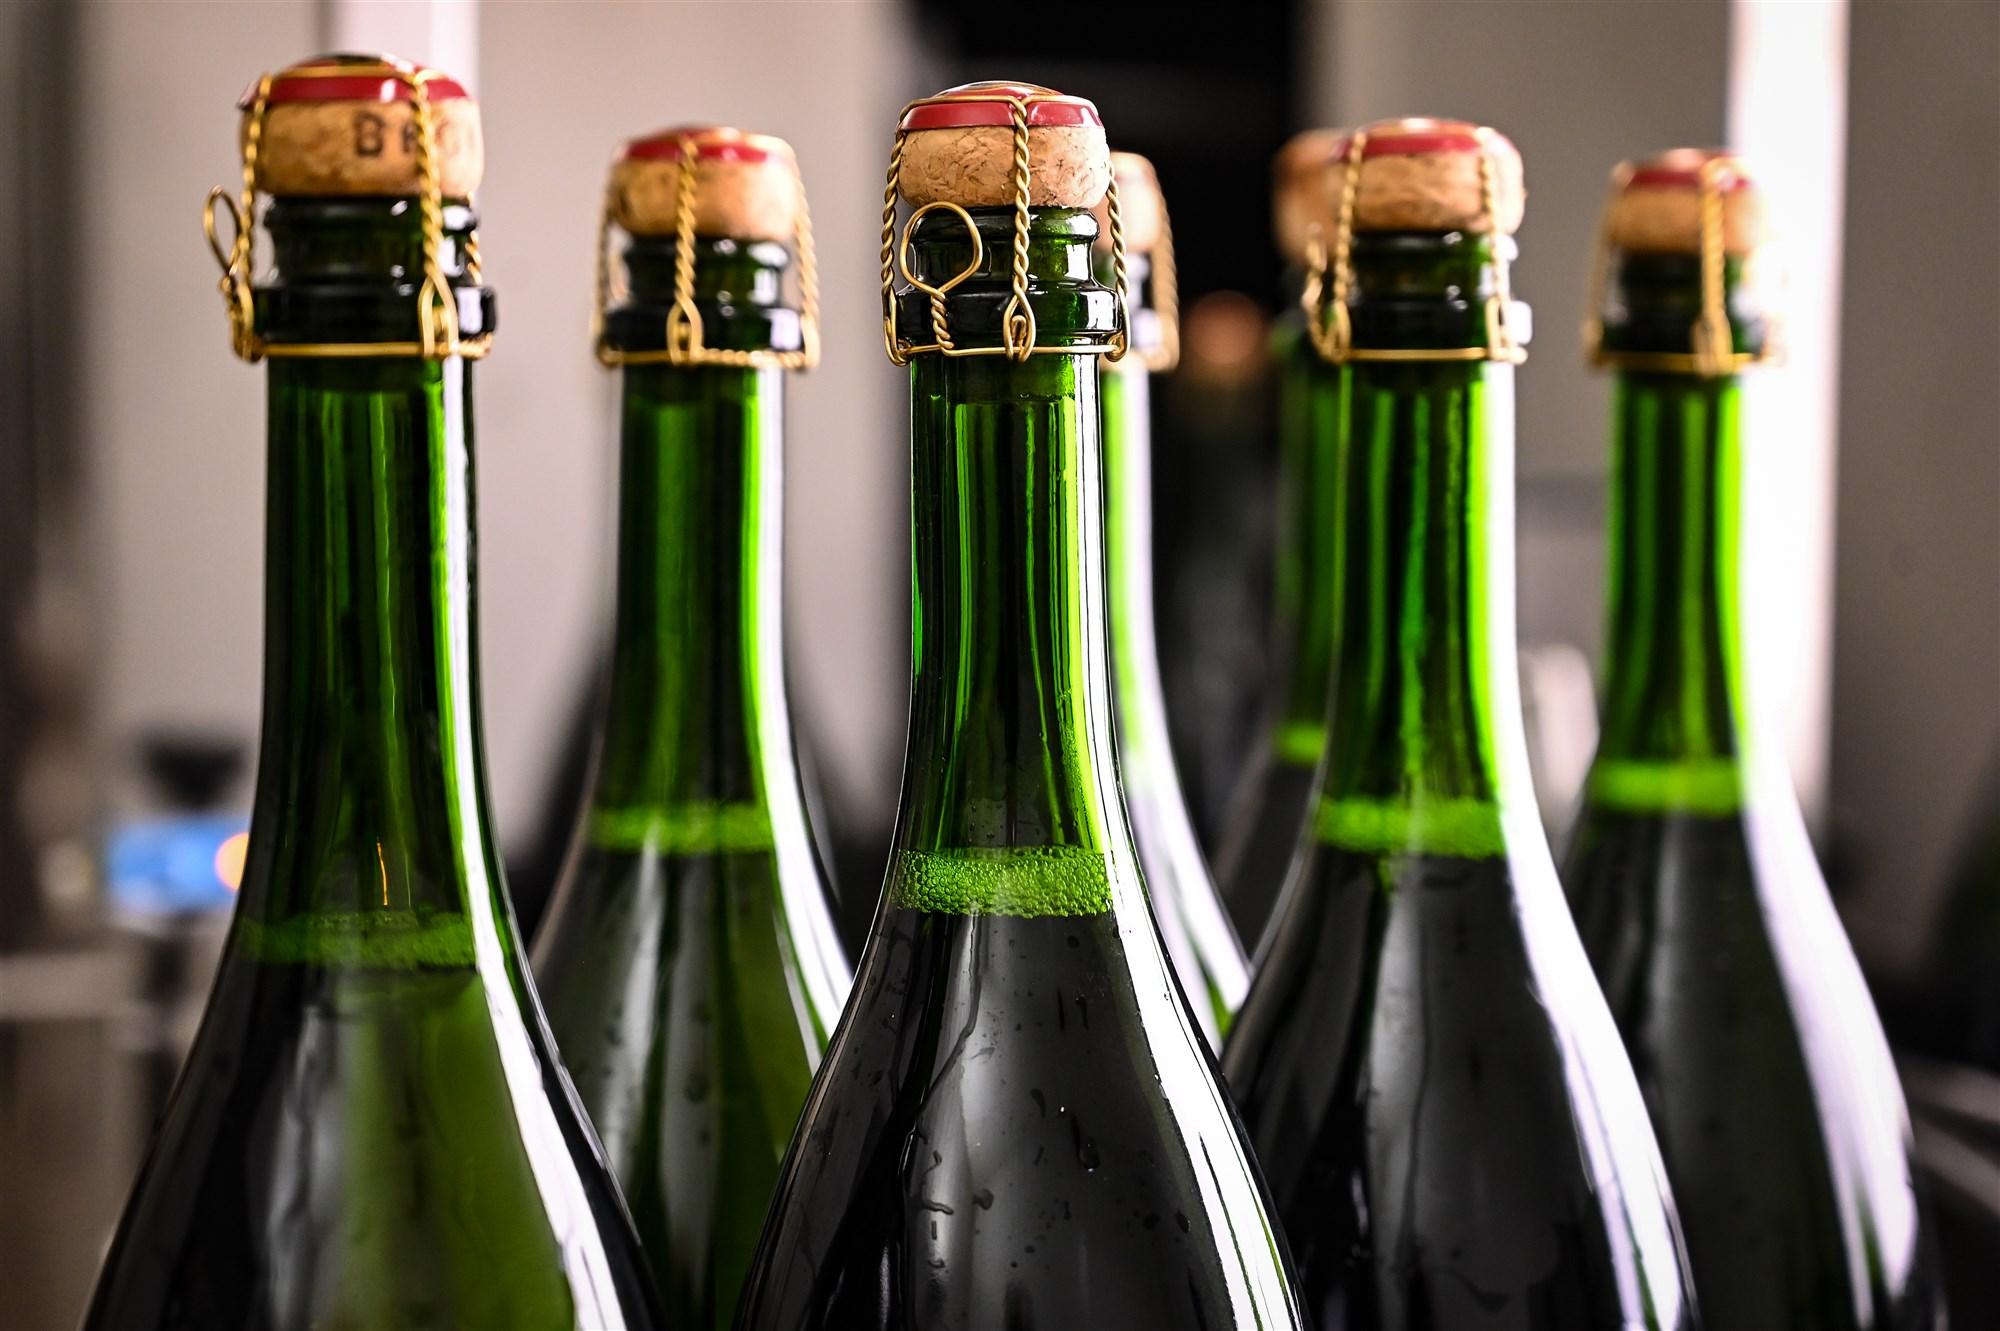 ANP-426015427 champagne